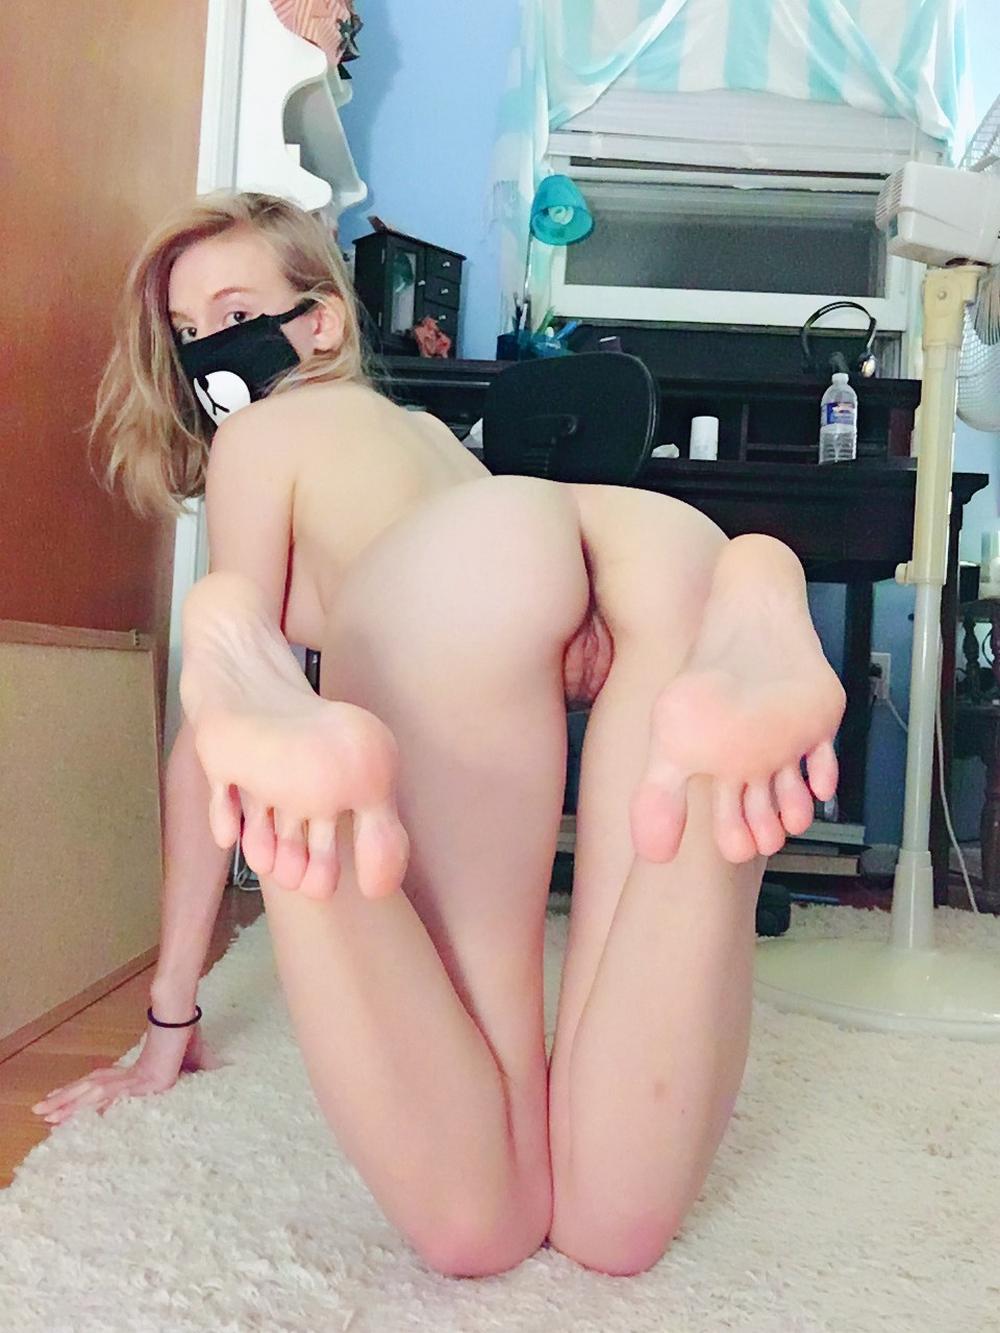 Блондинка в маске ищет парня для футфетиша и траха в мохнатку секс фото и порно фото